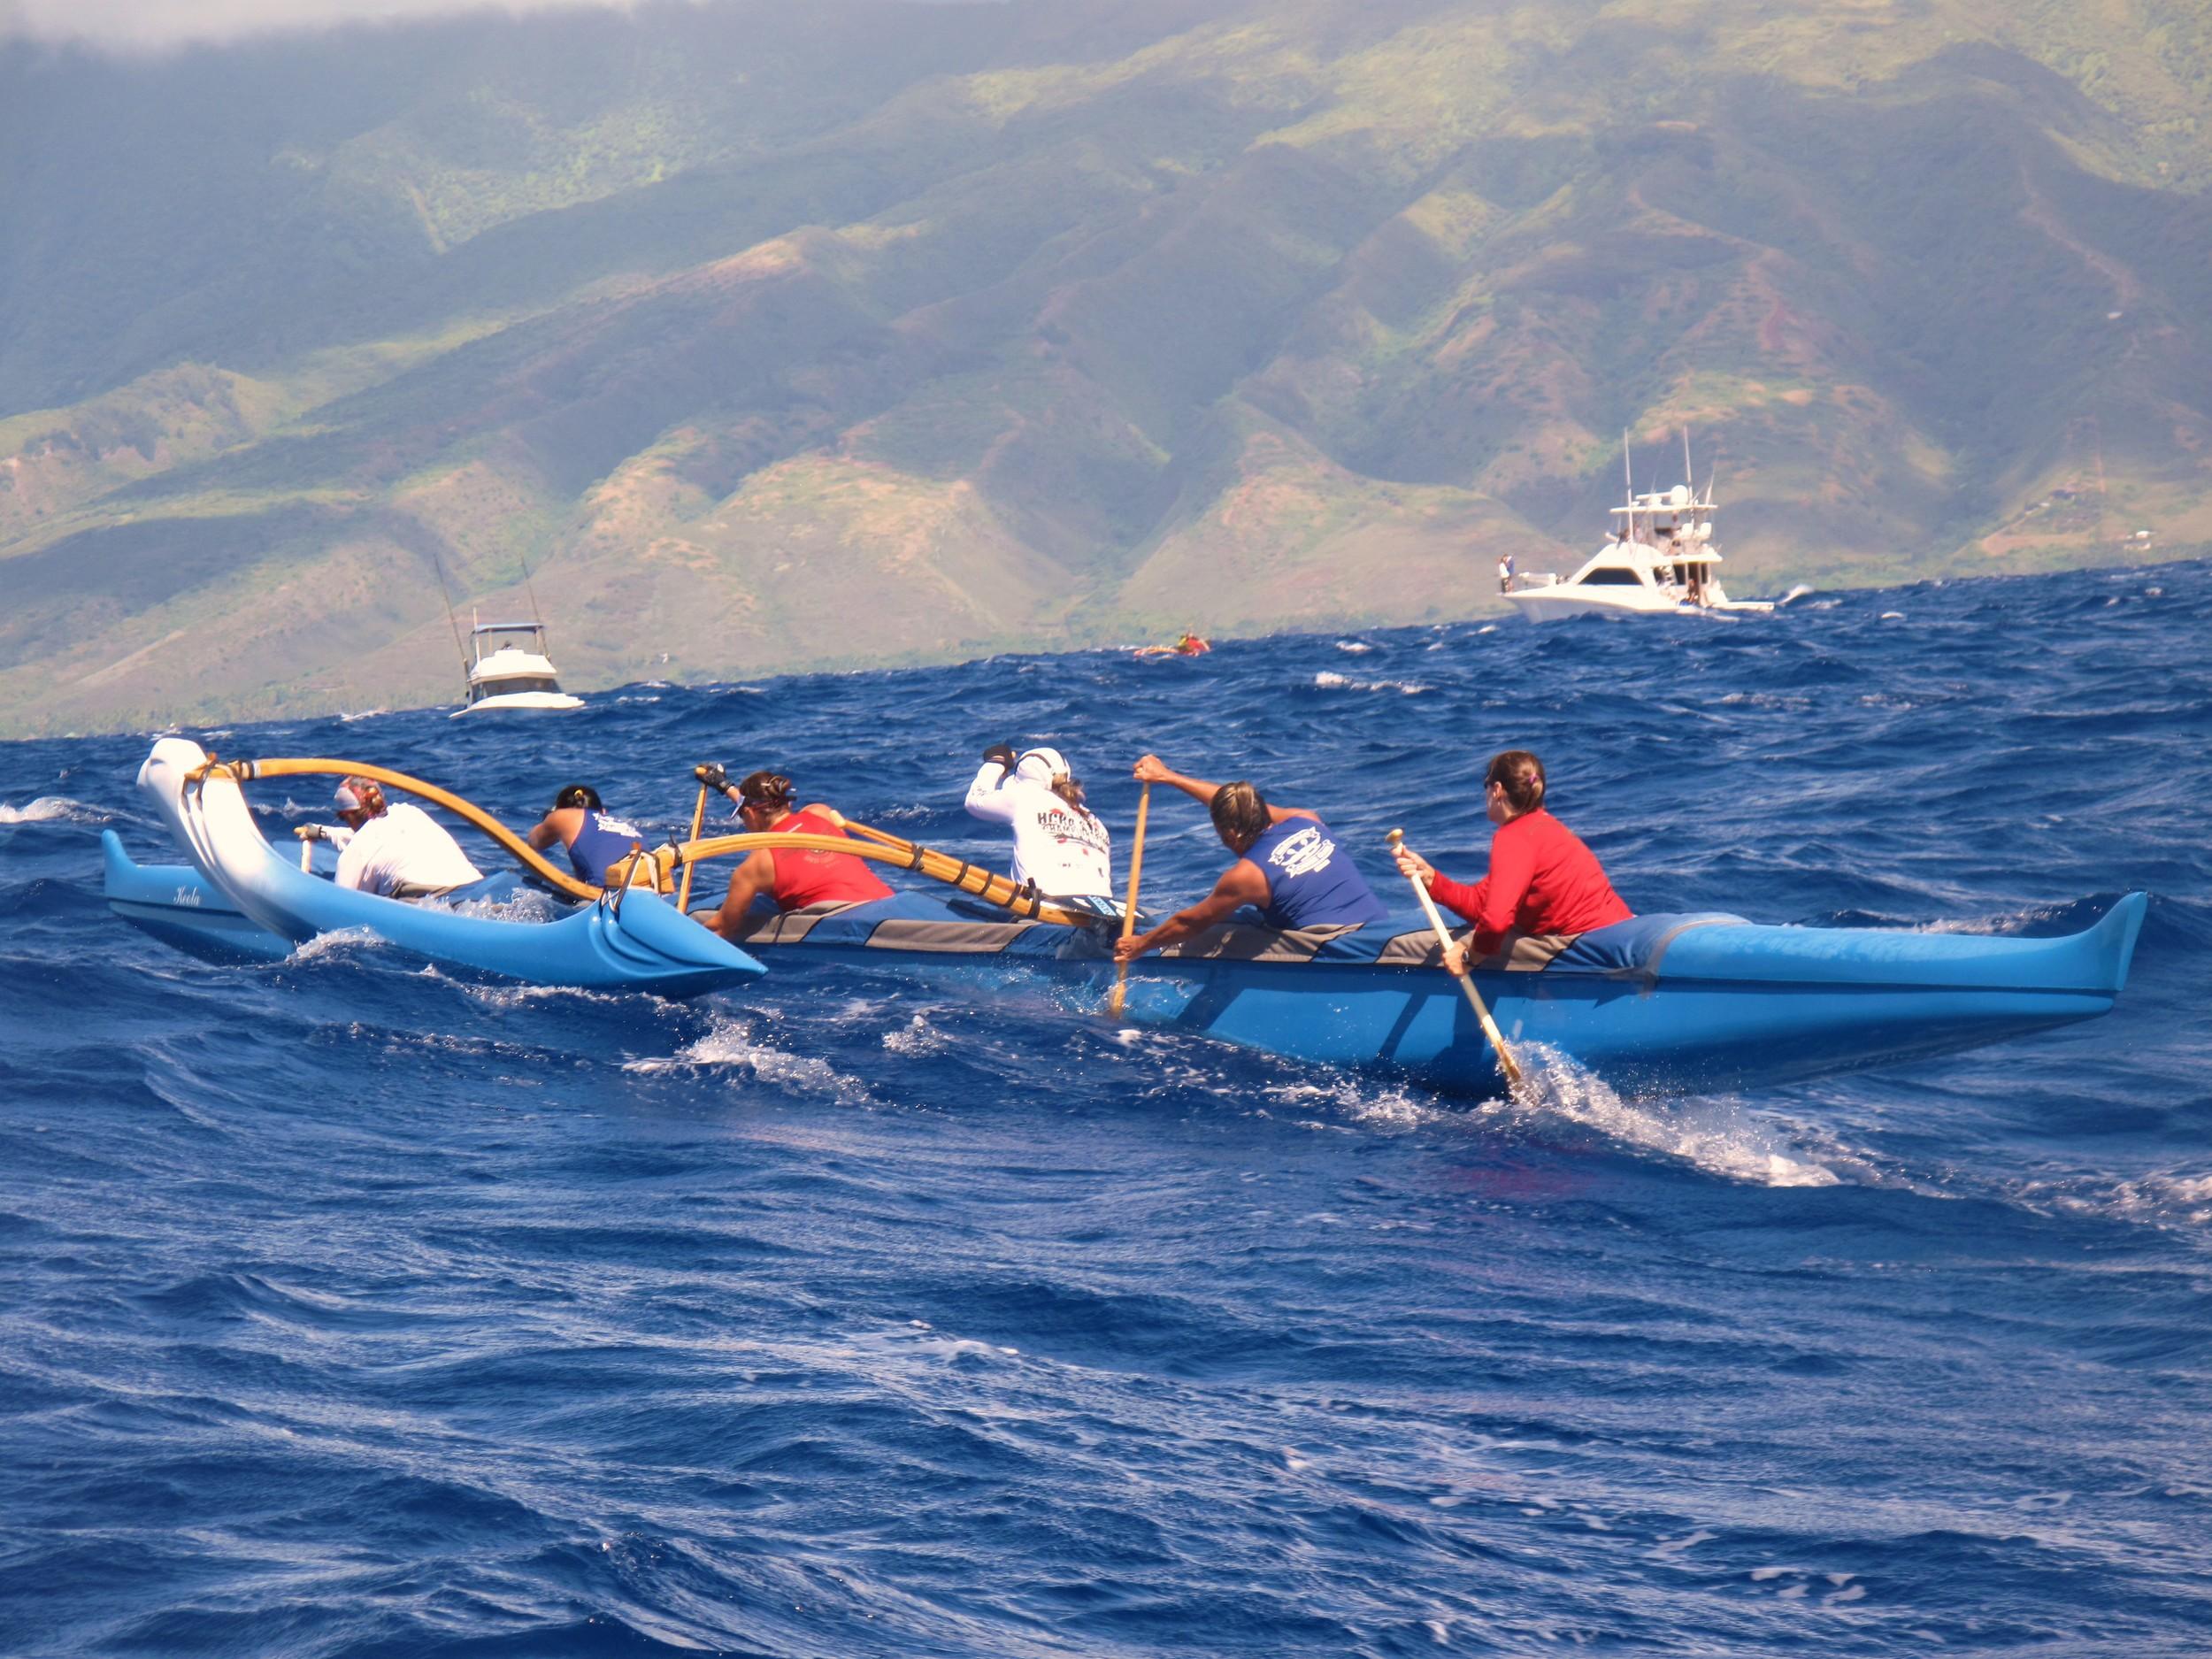 Canoe racing off the coast of Maui Hawaii